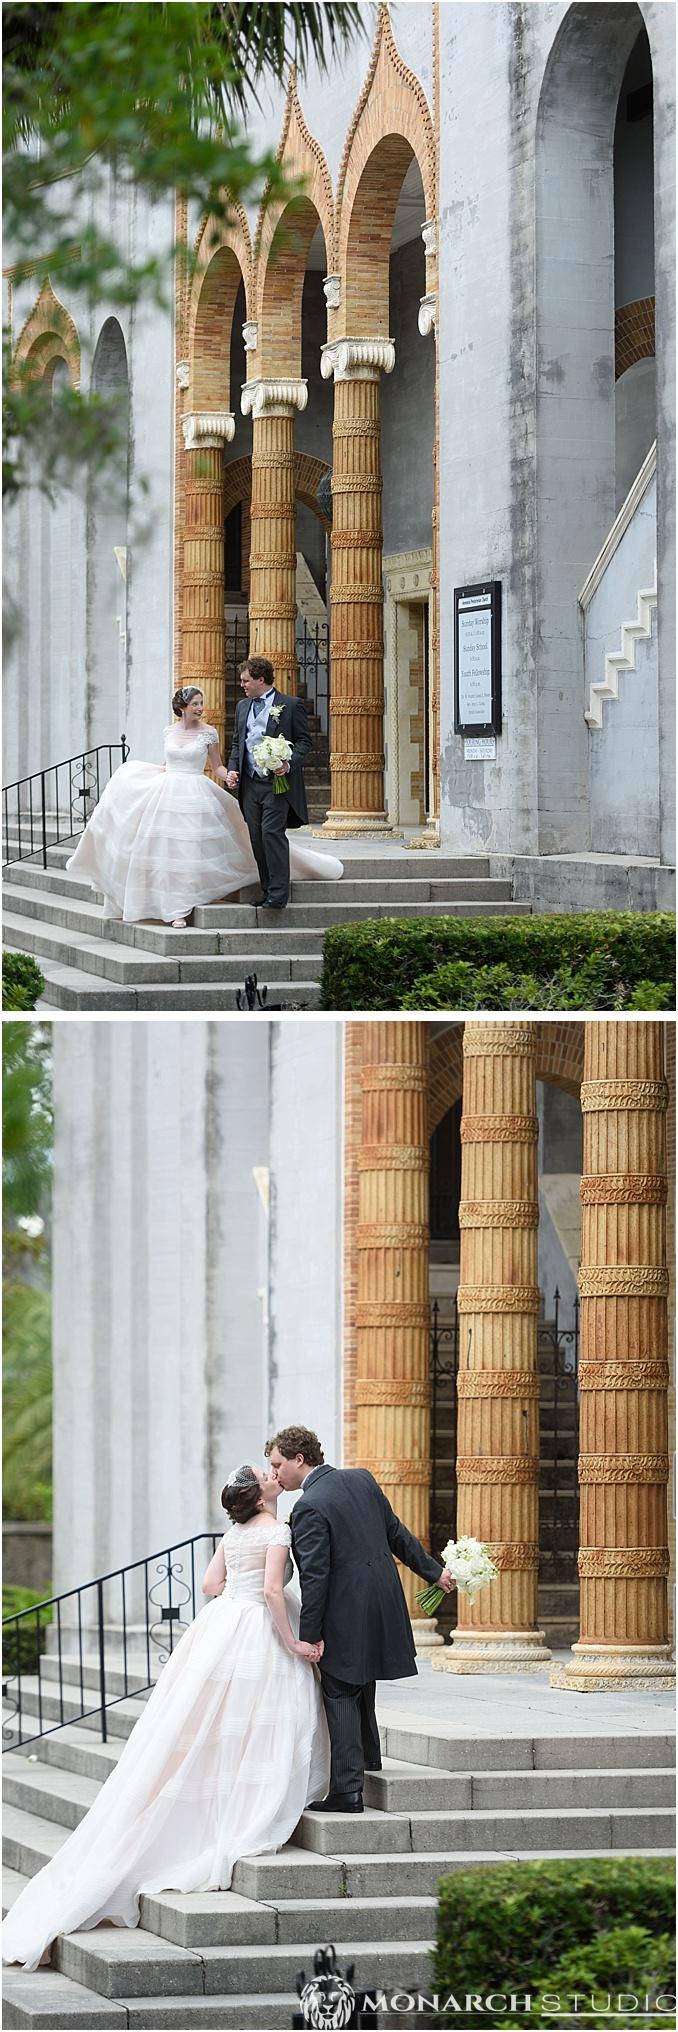 070-st-augustine-wedding-photographer-.jpg